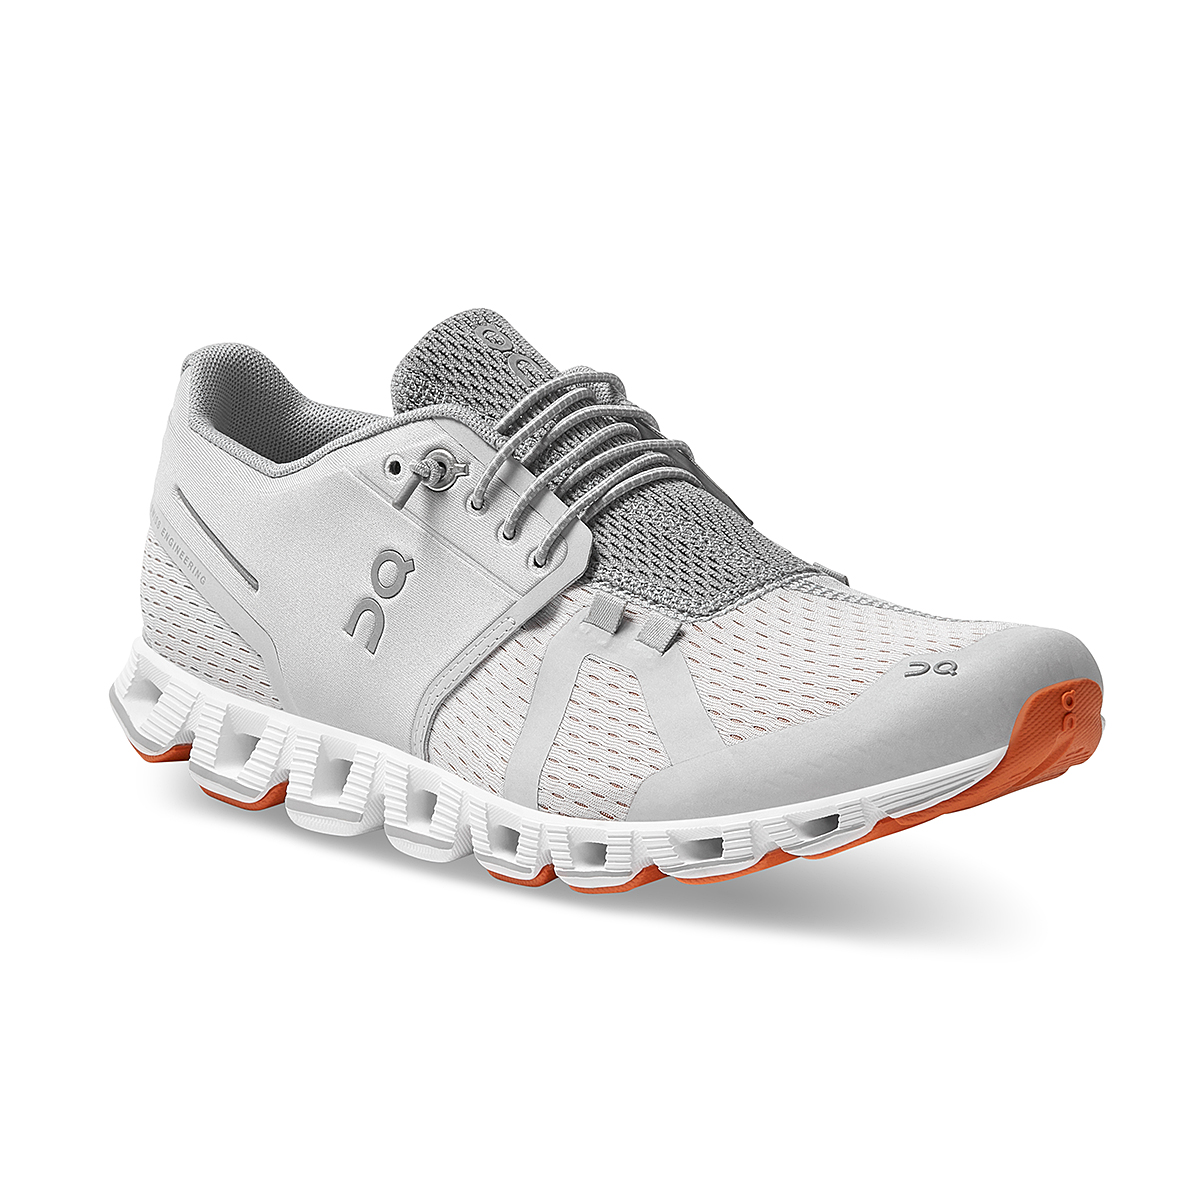 Women's On Cloud Running Shoe - Color: Glacier/White - Size: 5 - Width: Regular, Glacier/White, large, image 2